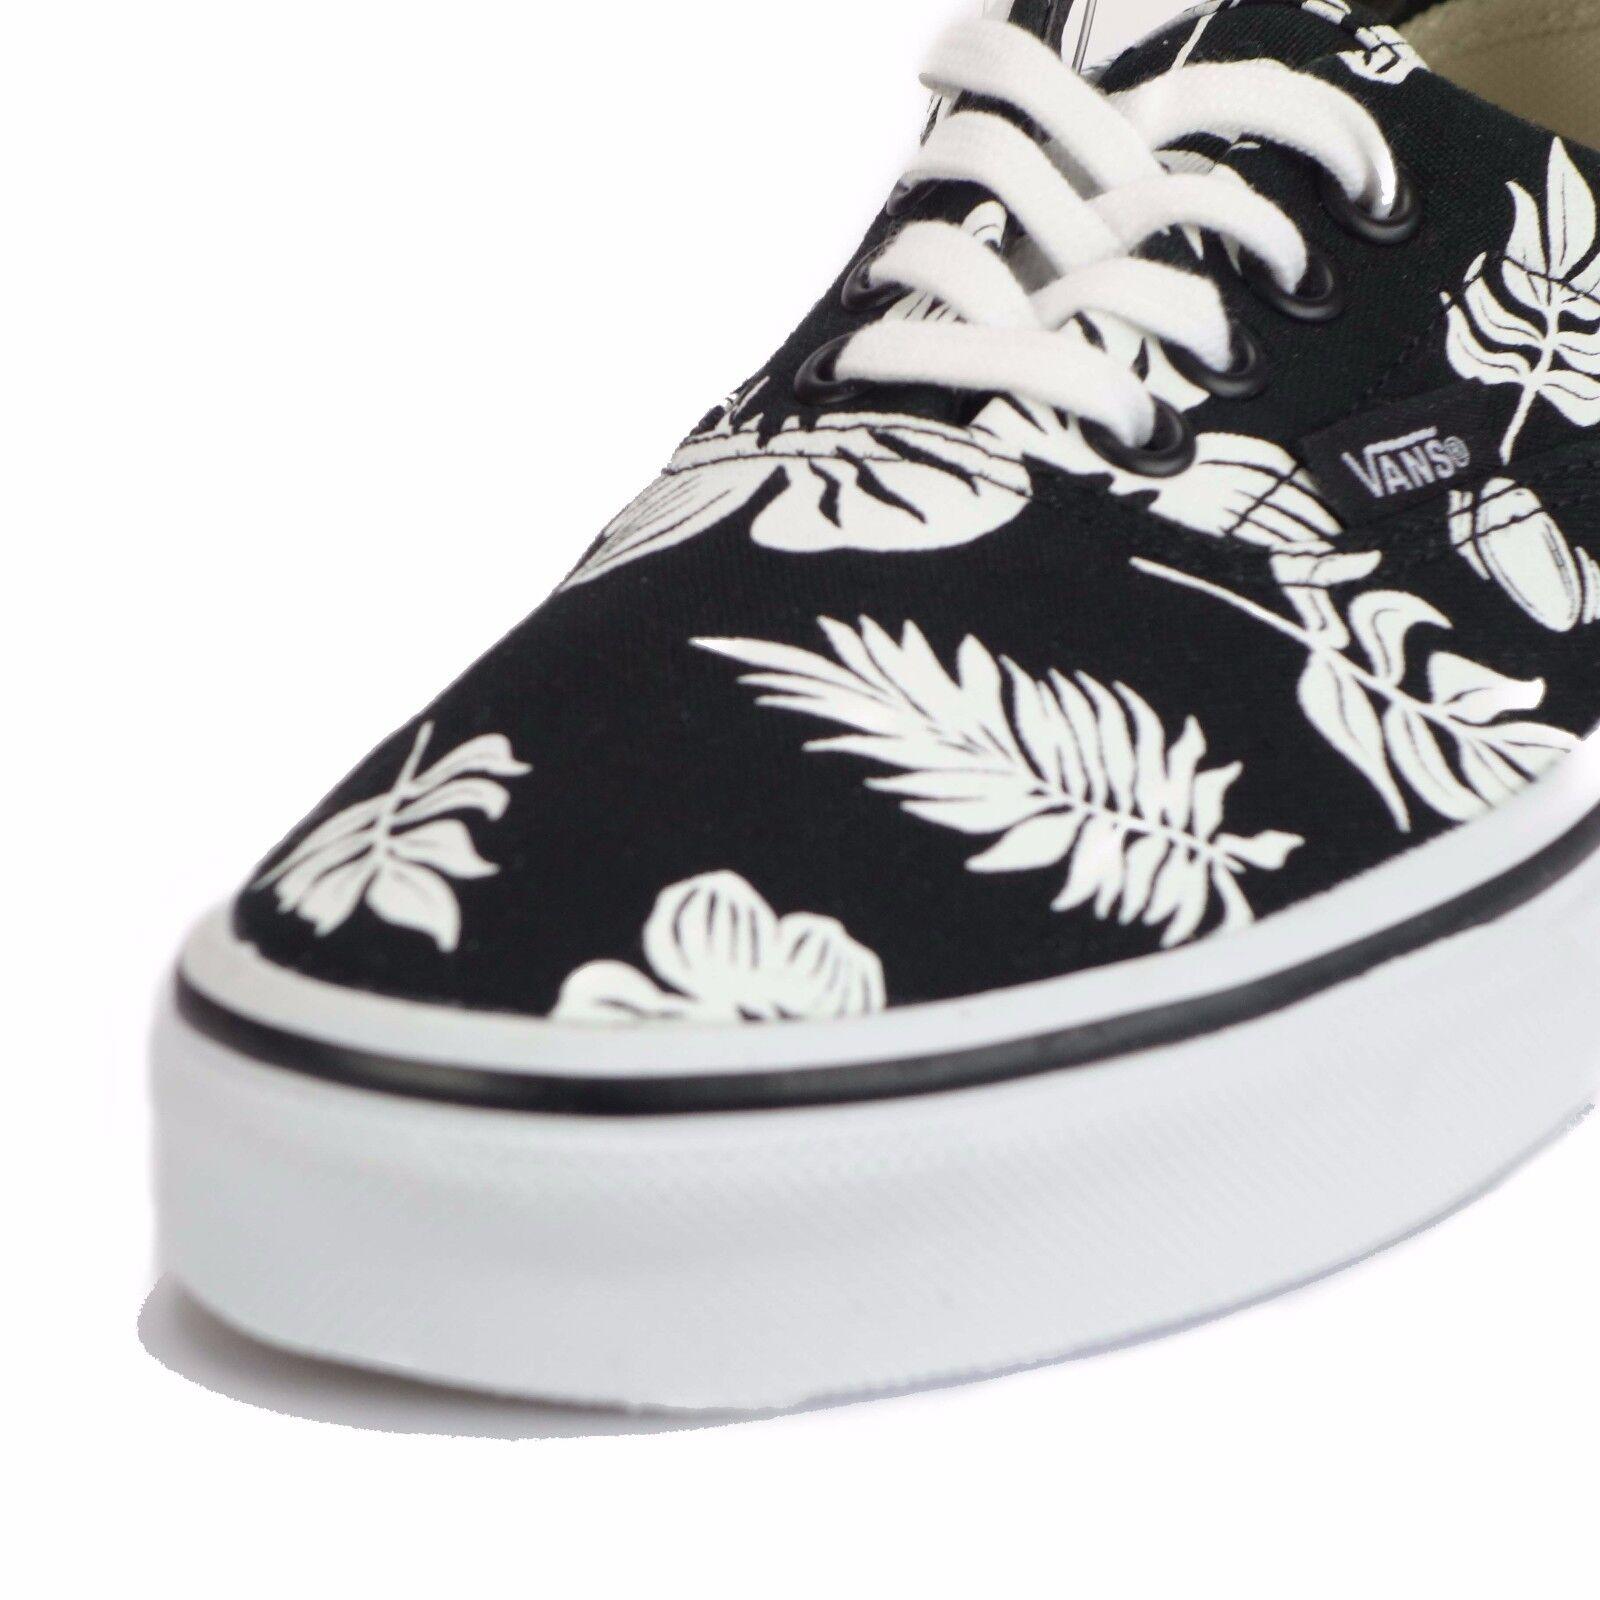 Transporter Era Tropicoco/black (MLX) Blumenmuster unisex Schuhe Tropicoco/black Era be2ce5